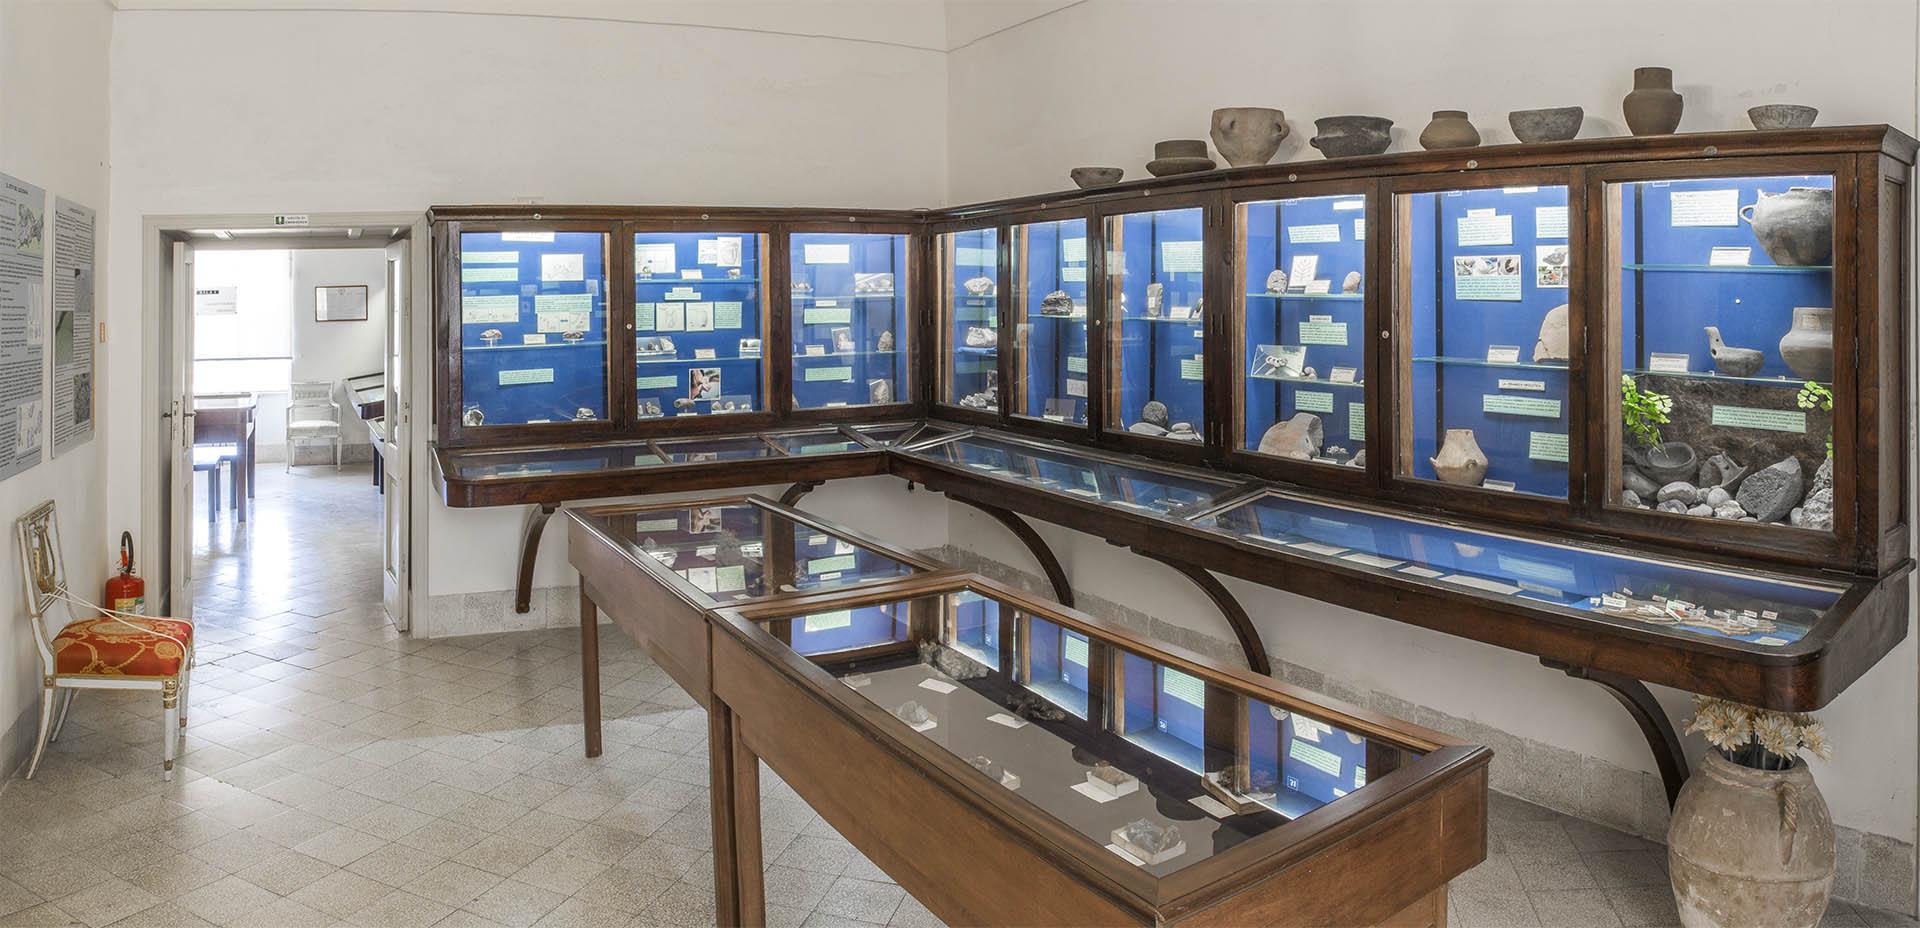 The Prehistory and Protohistory Hall - Ignazio Cerio Museum Capri